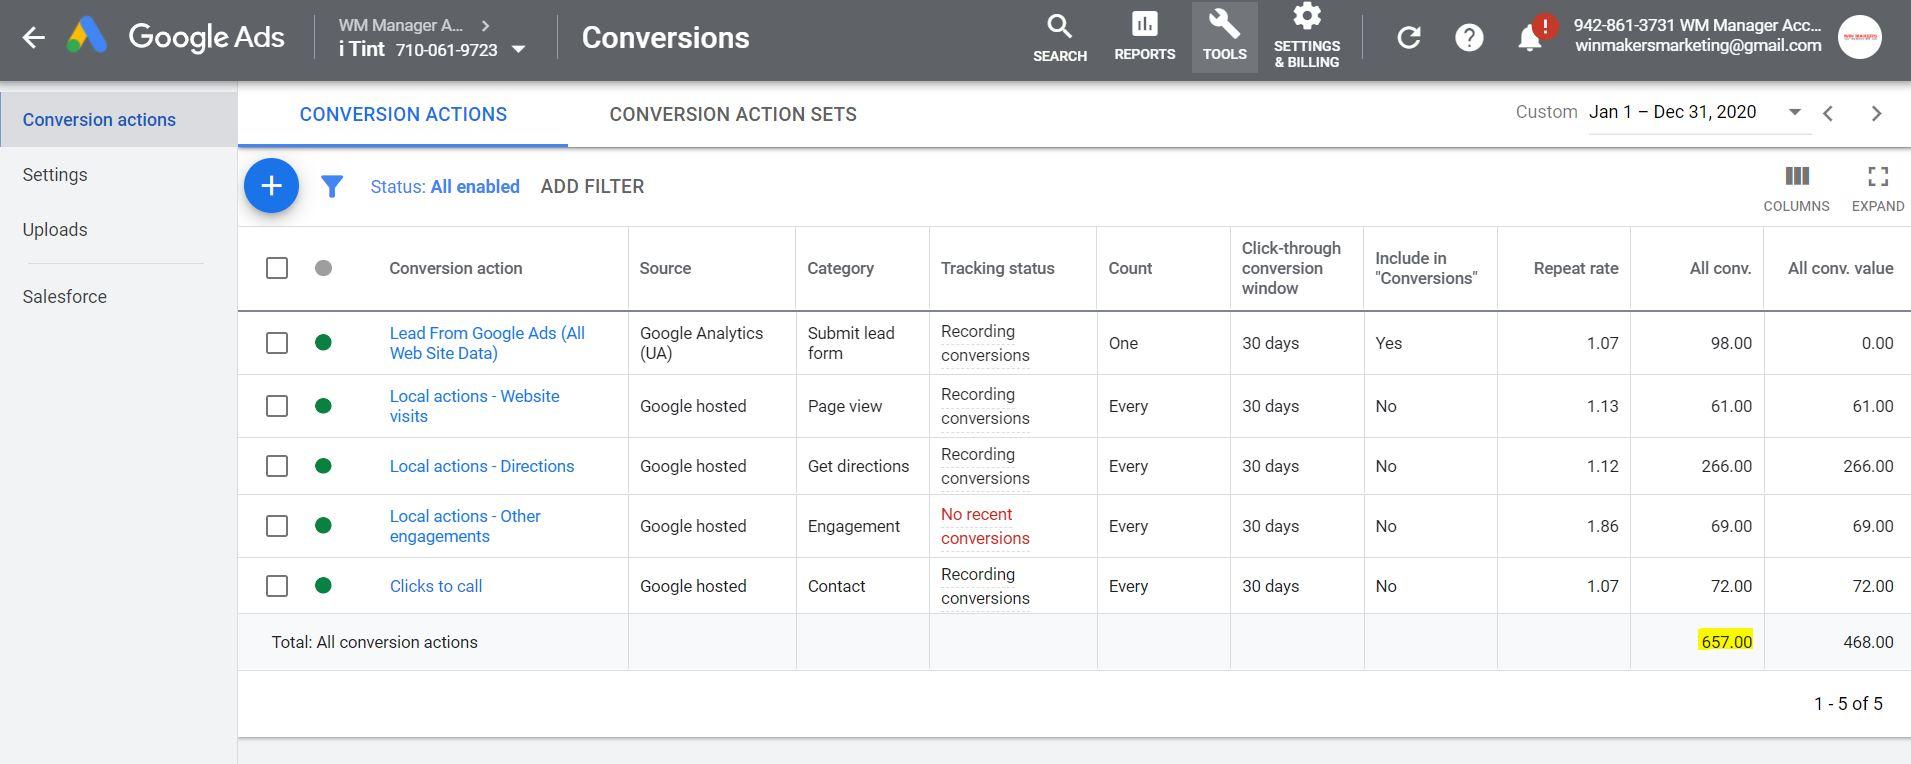 Google Ads case study I Tint 2